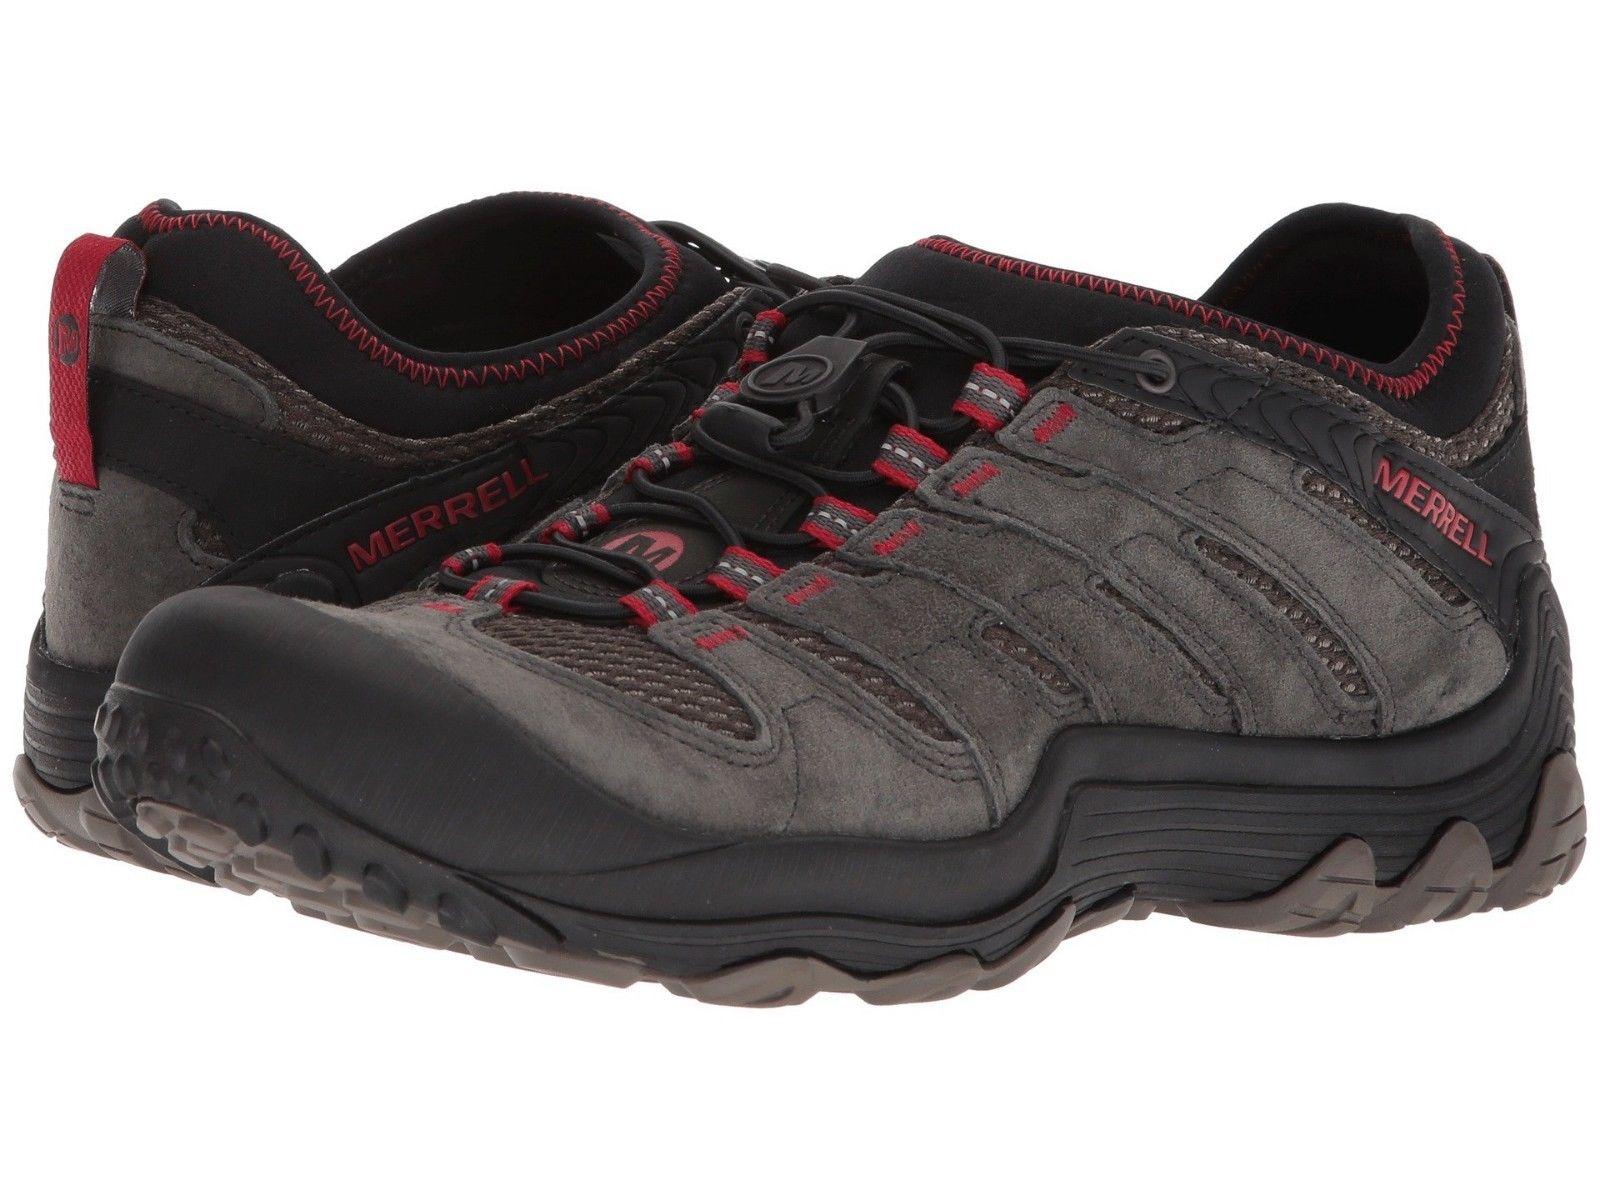 6530f589f6842 Details about Merrell Men's Chameleon 7 Stretch Trail Shoe Boot Size US 8.5  D / EU 42 NIB